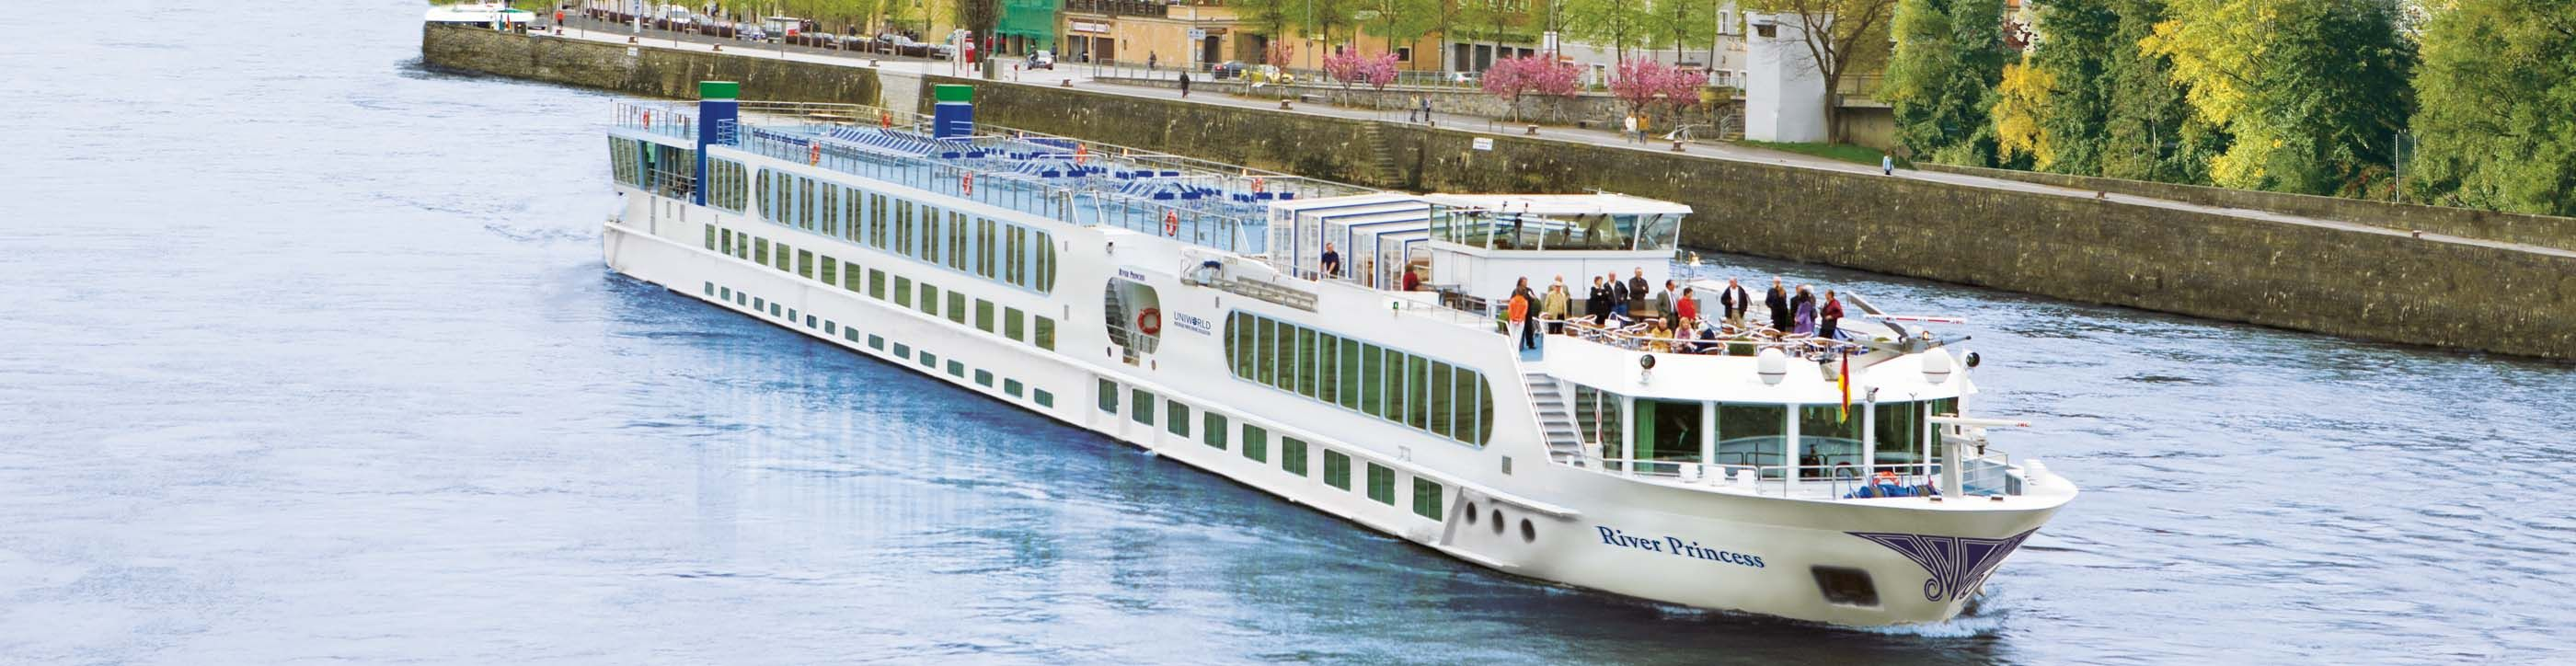 Uniworld Adds Three New Istanbul River Cruises For Cruises - River cruise ships europe